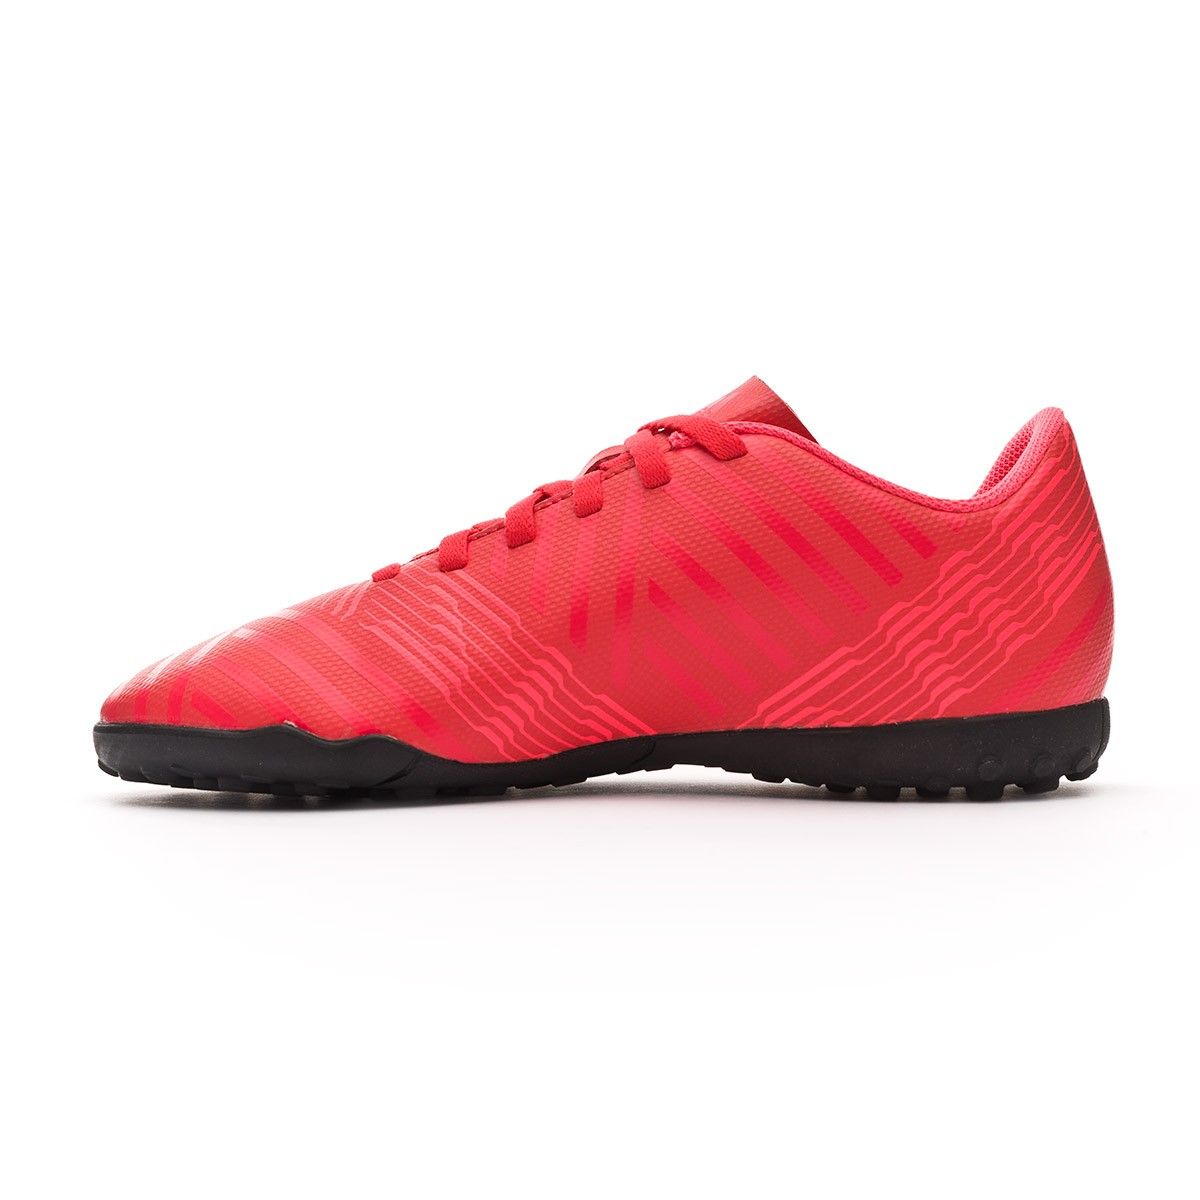 d74eddb35e59 Football Boot adidas Kids Nemeziz Tango 17.4 Turf Real coral-Red zest-Core  black - Football store Fútbol Emotion